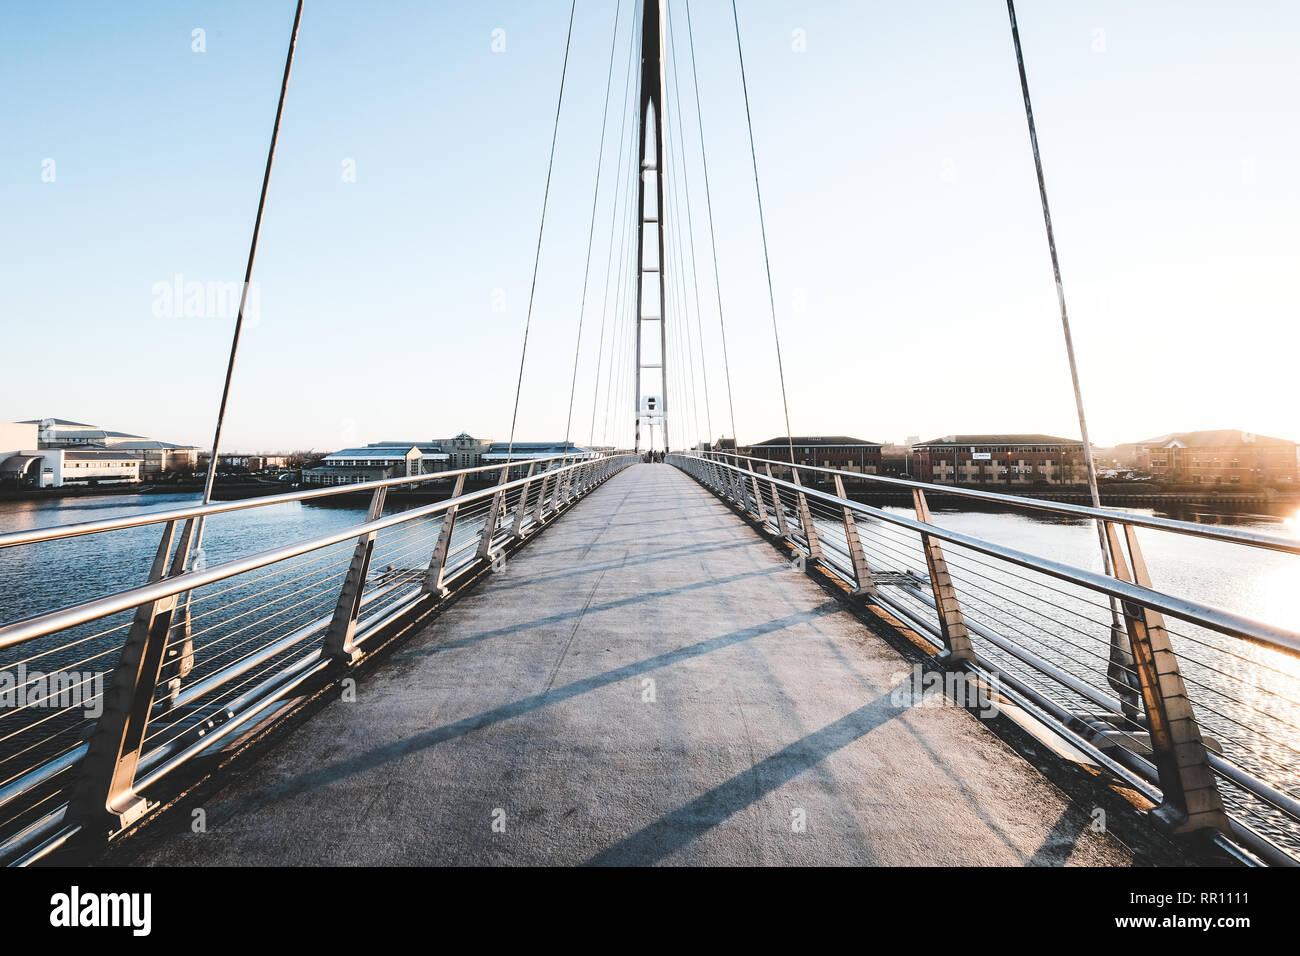 Puente de infinito en Stockton-on-Tees, Inglaterra Foto de stock